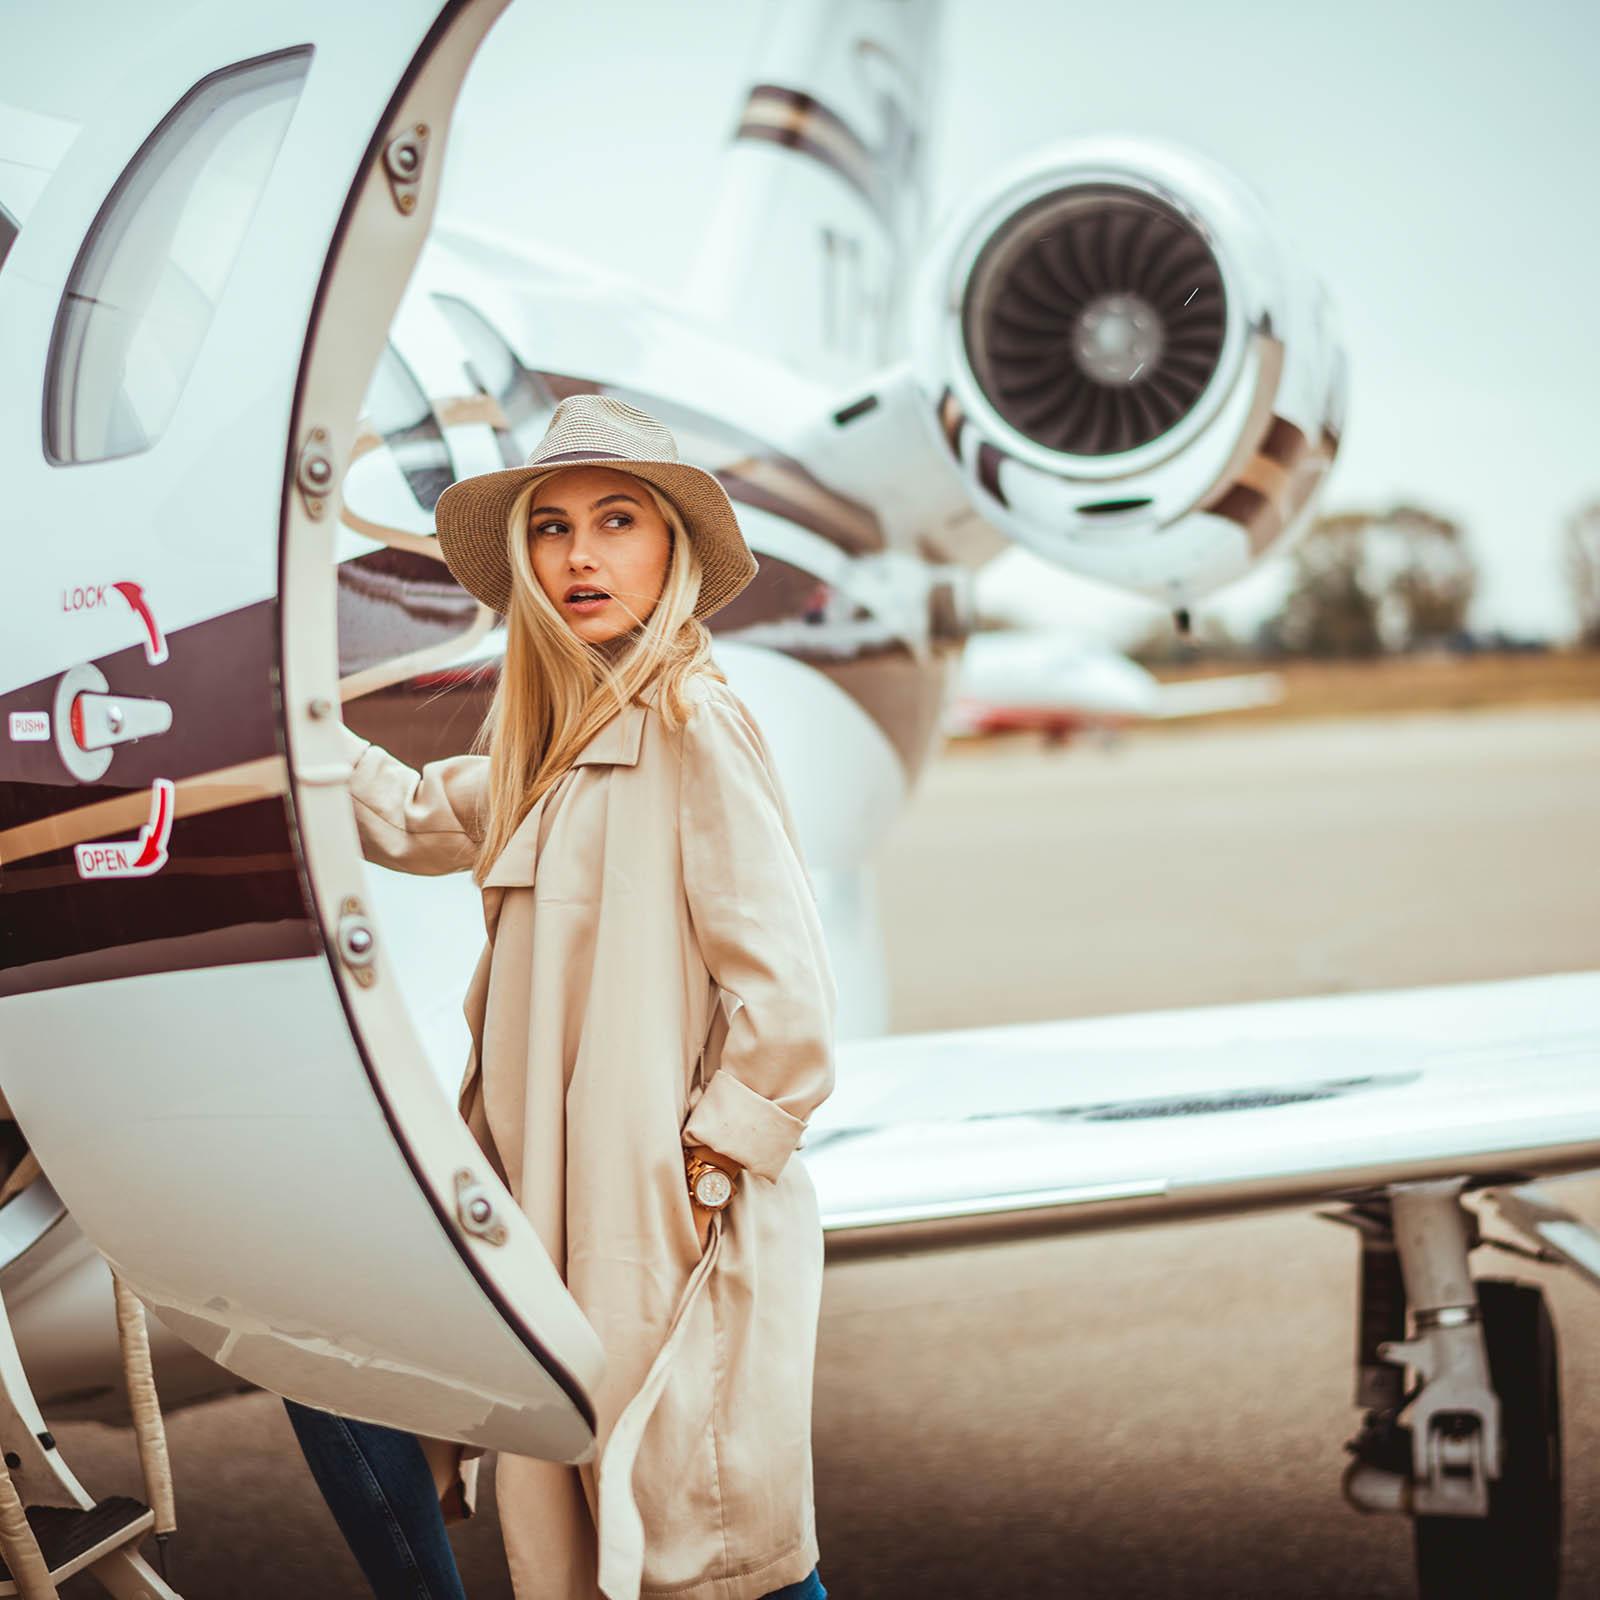 Private Plane Jet Rental From Midland Odessa